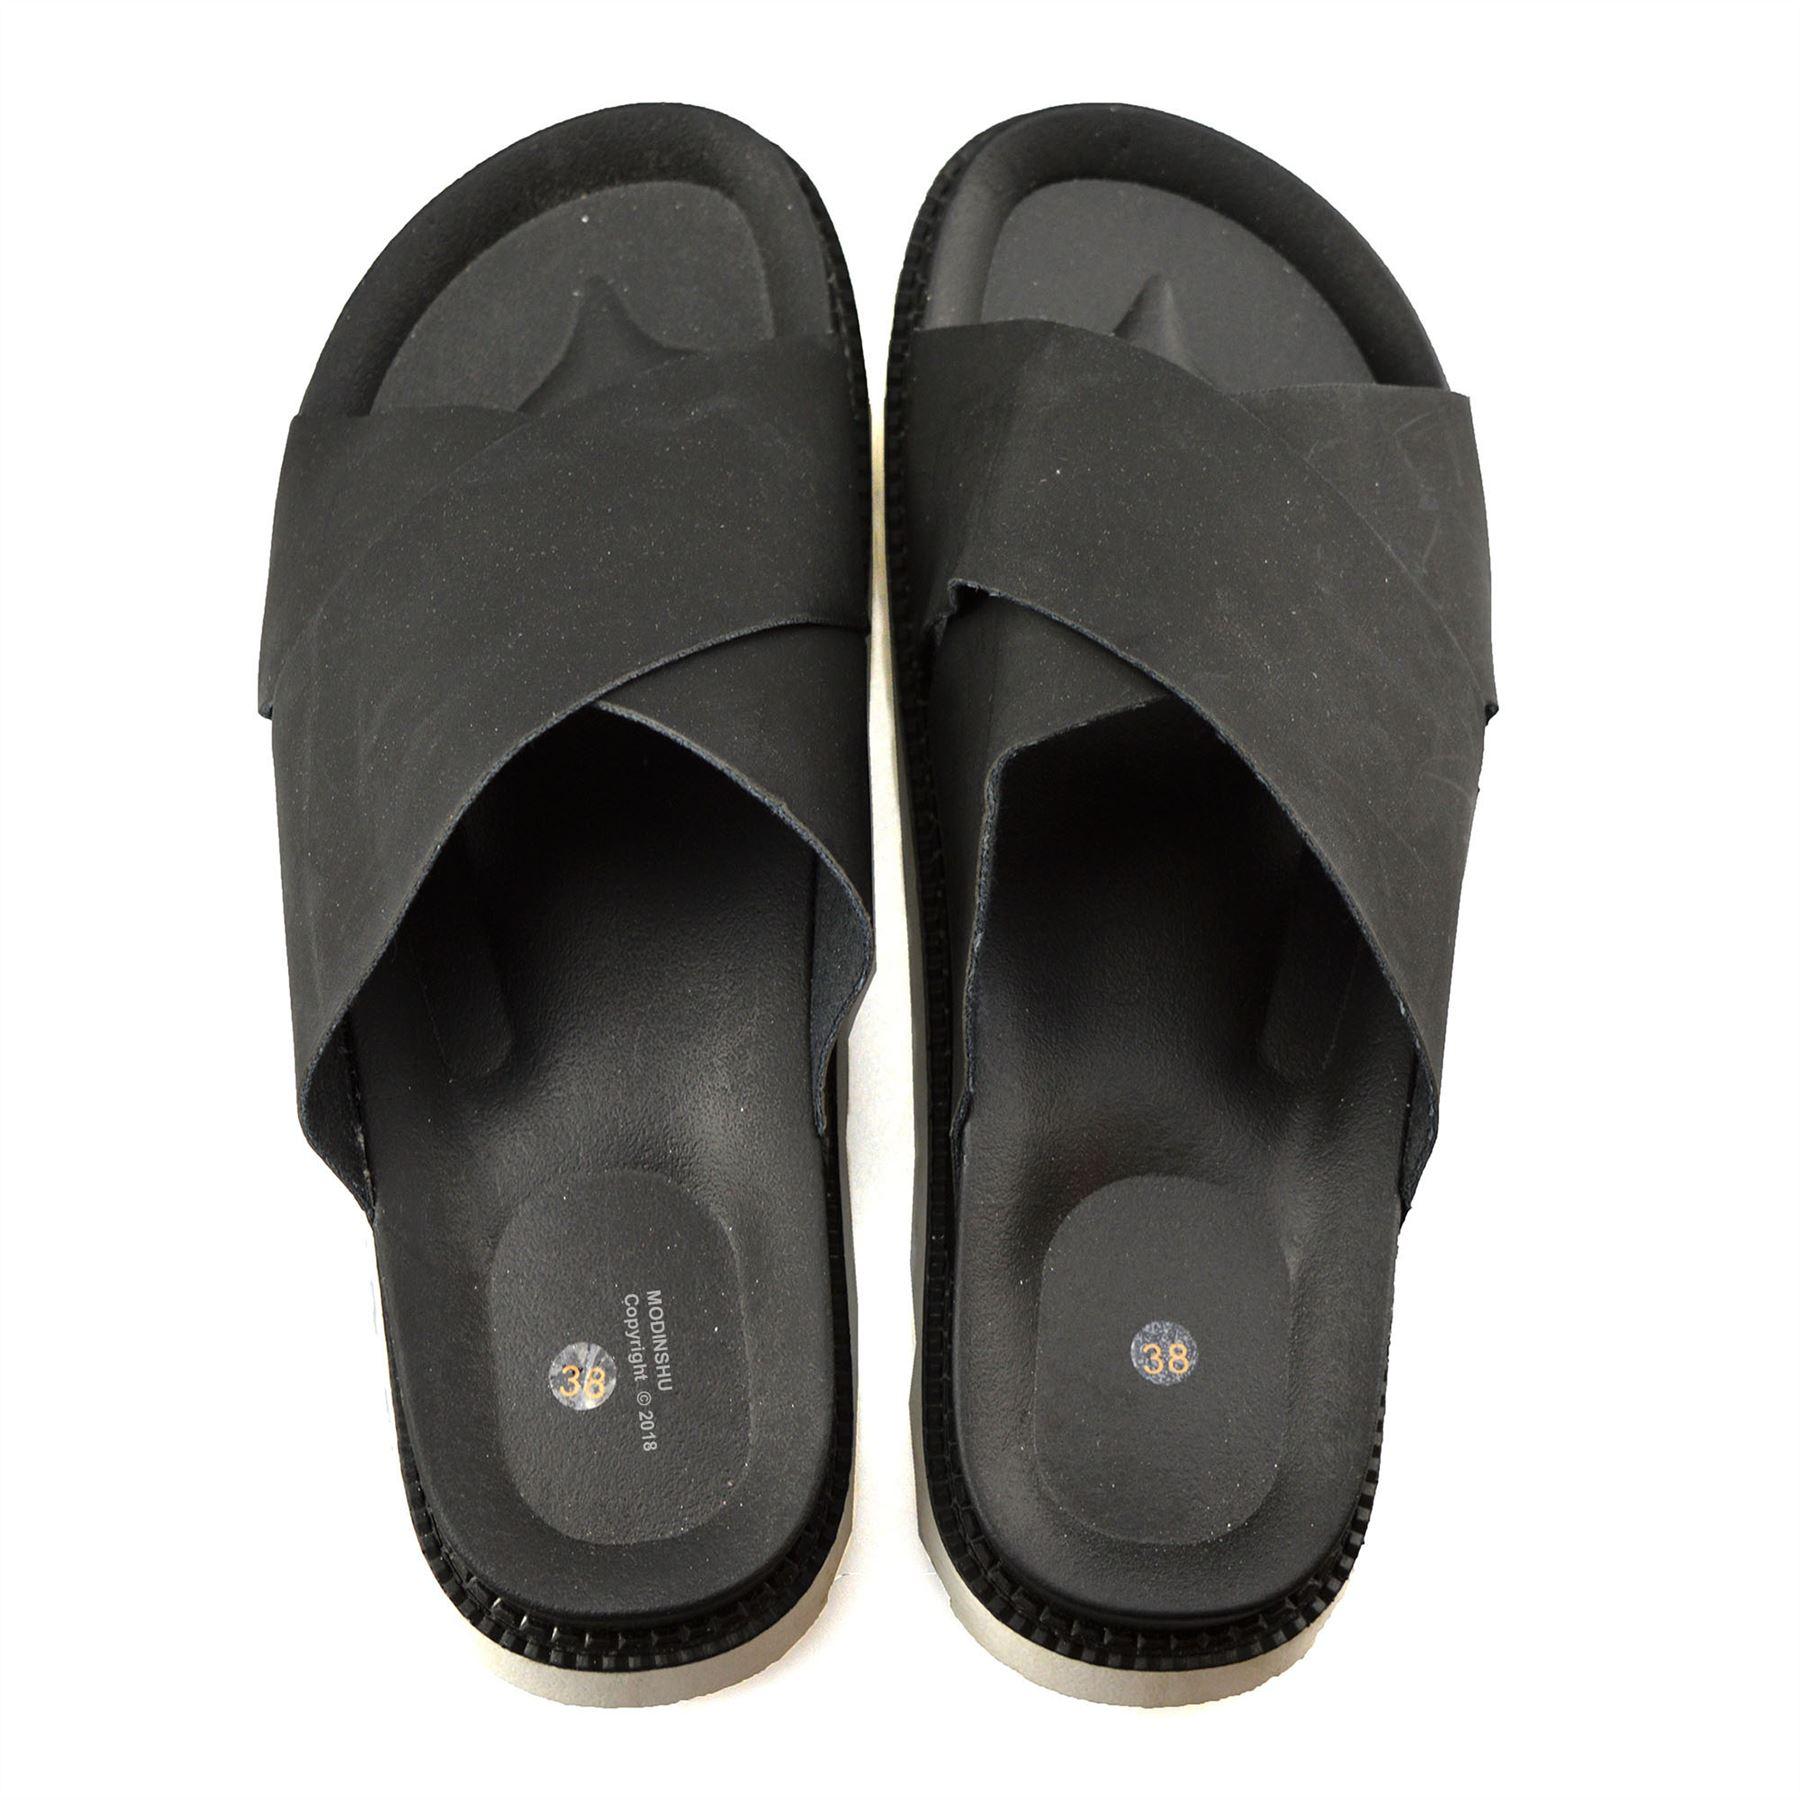 Ladies-Womens-Low-Flat-Heel-Slip-On-Summer-Beach-Mules-Footbed-Sandals-Shoe-Size